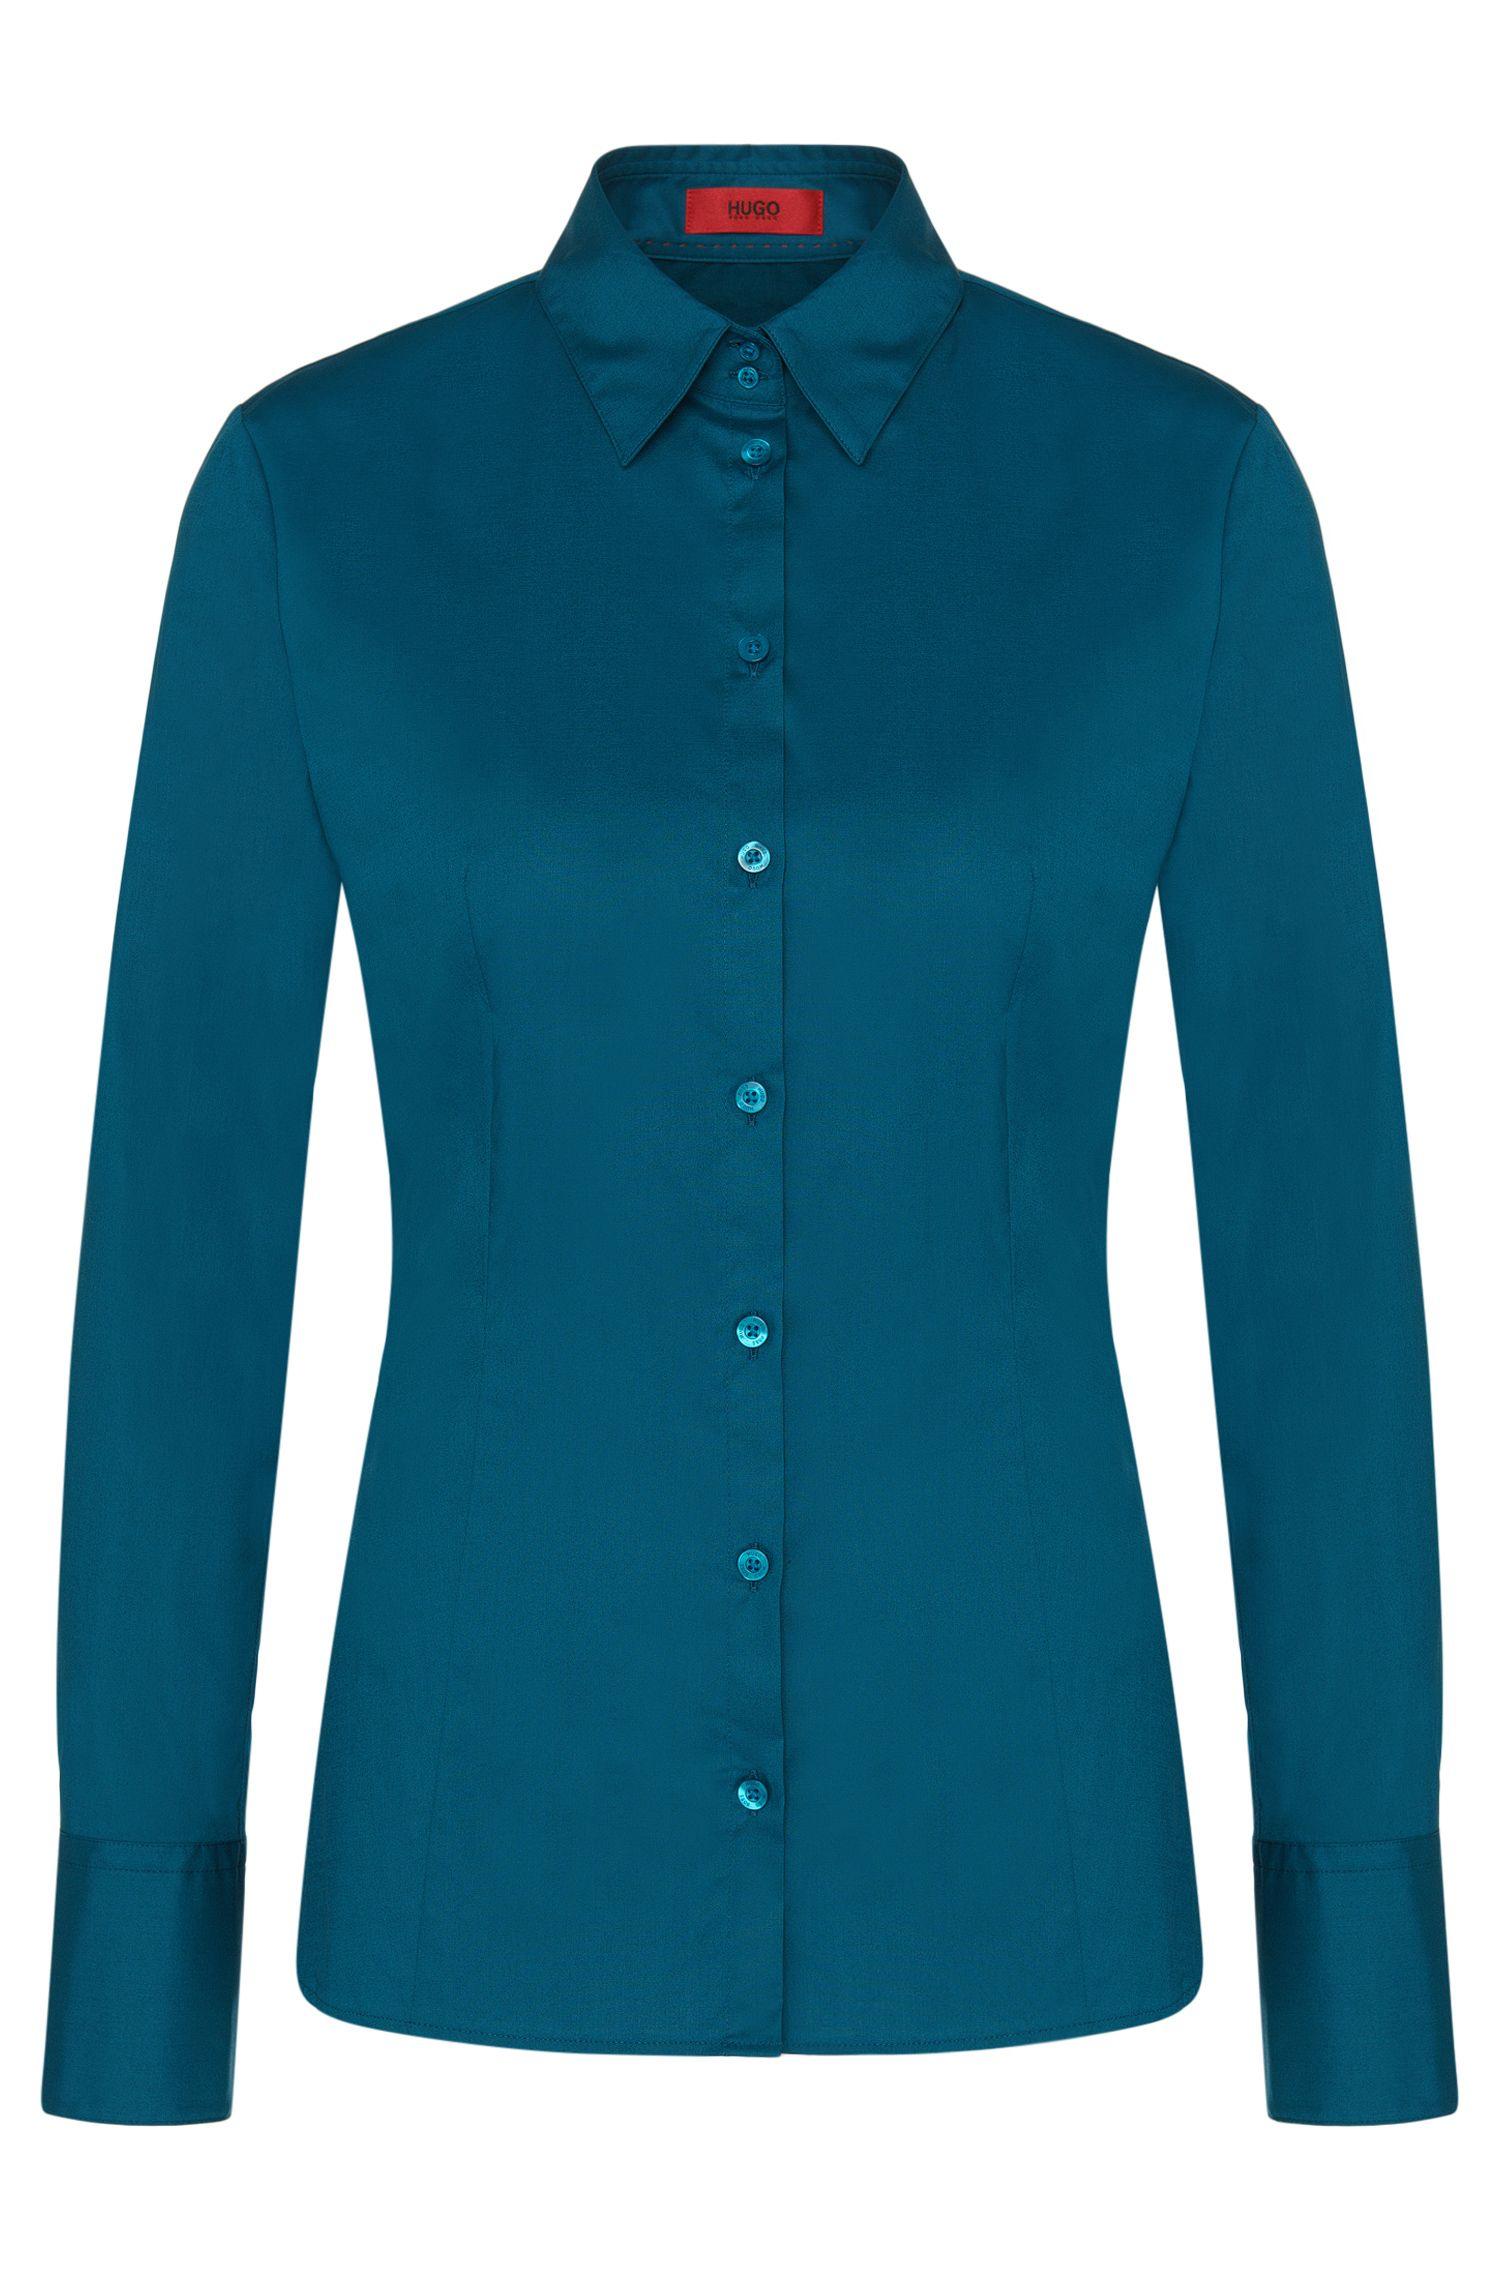 Unifarbene Hemdbluse aus Baumwoll-Mix: 'Etrixe1'